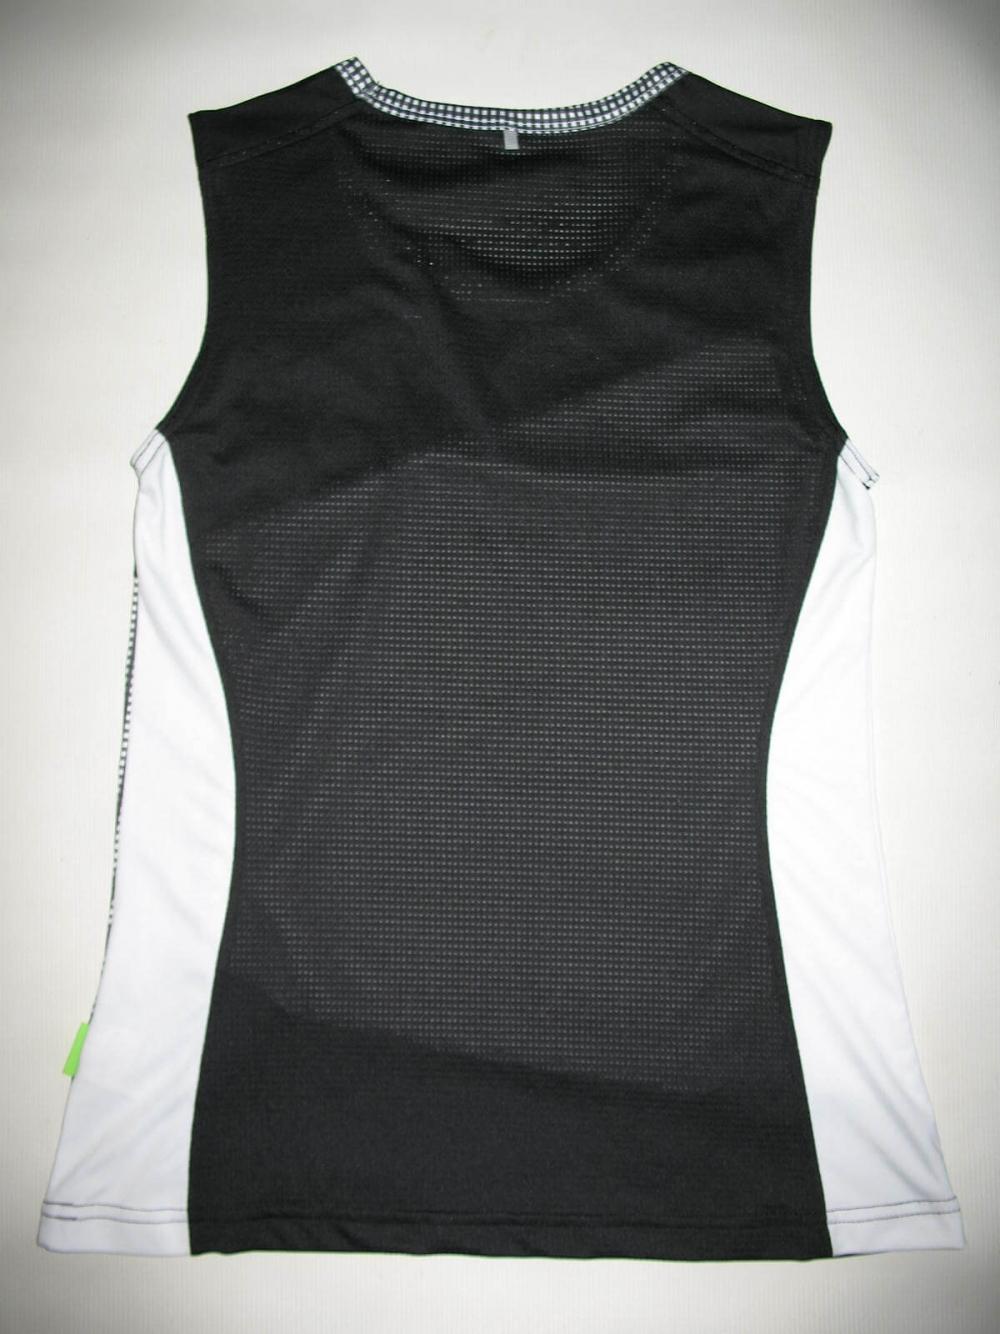 Майка LIMITEDsports top jersey lady (размер 36/S) - 1